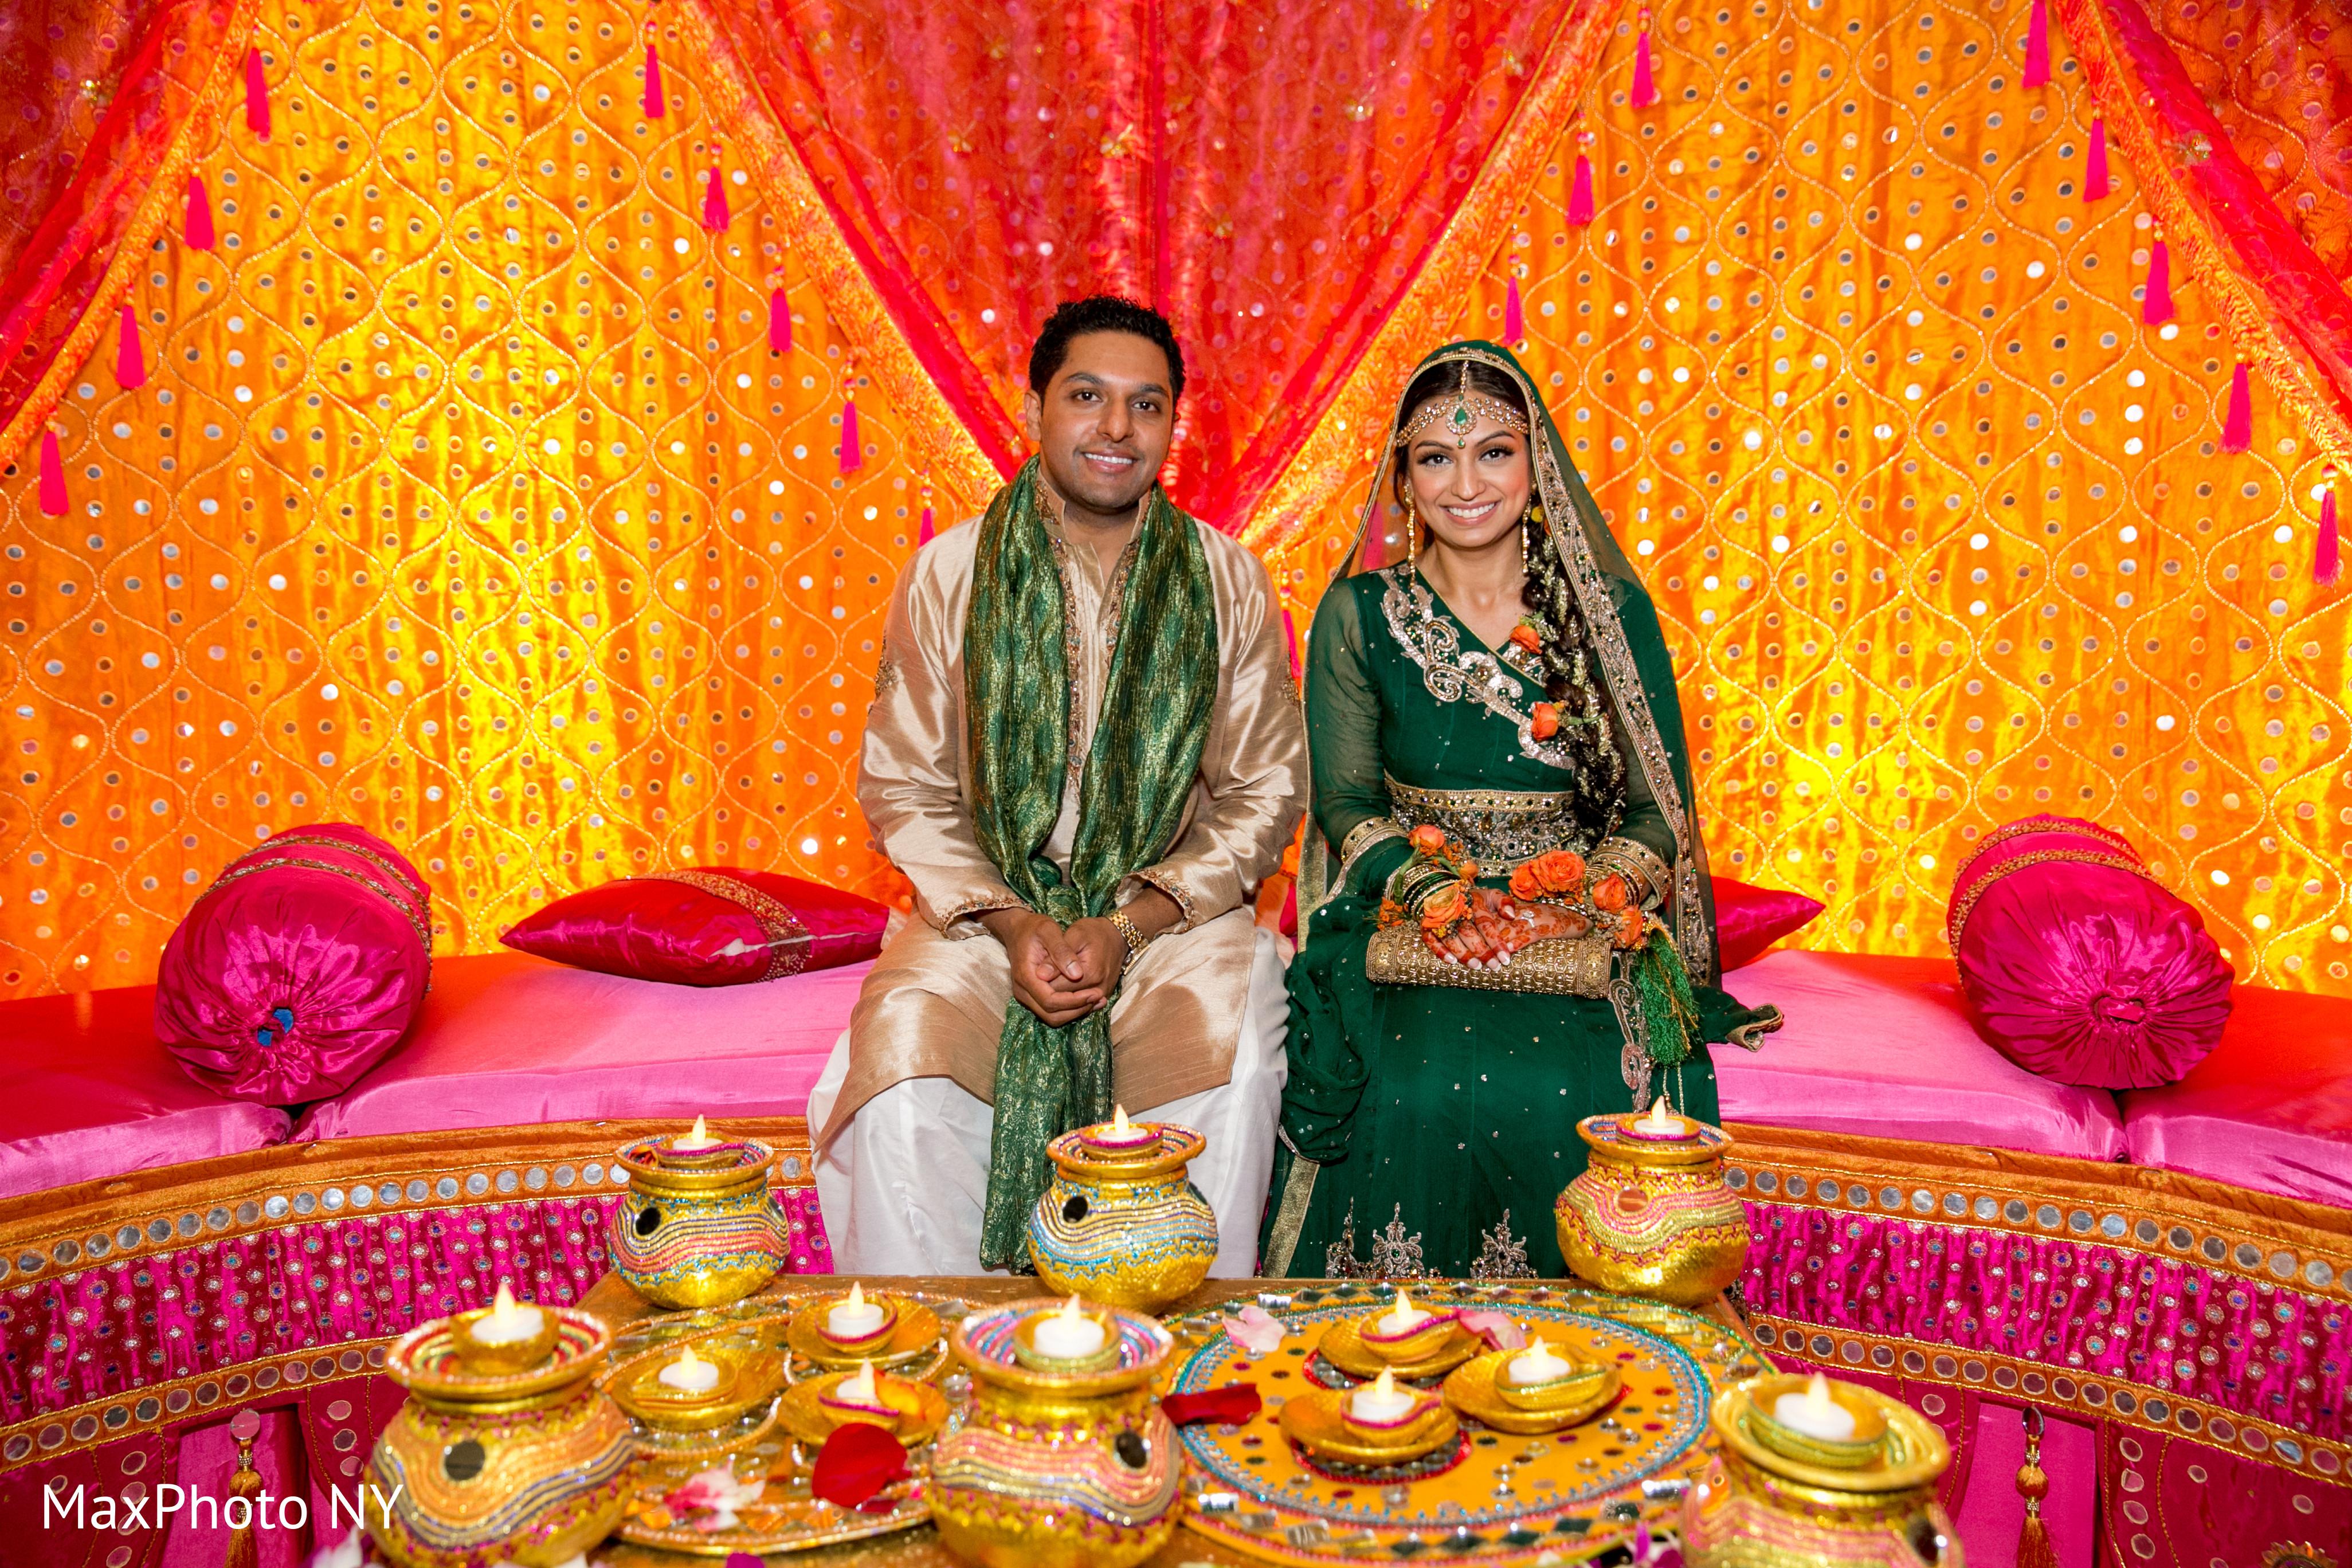 Mehndi Night Ceremony : Mehndi night in lake george ny pakistani wedding by